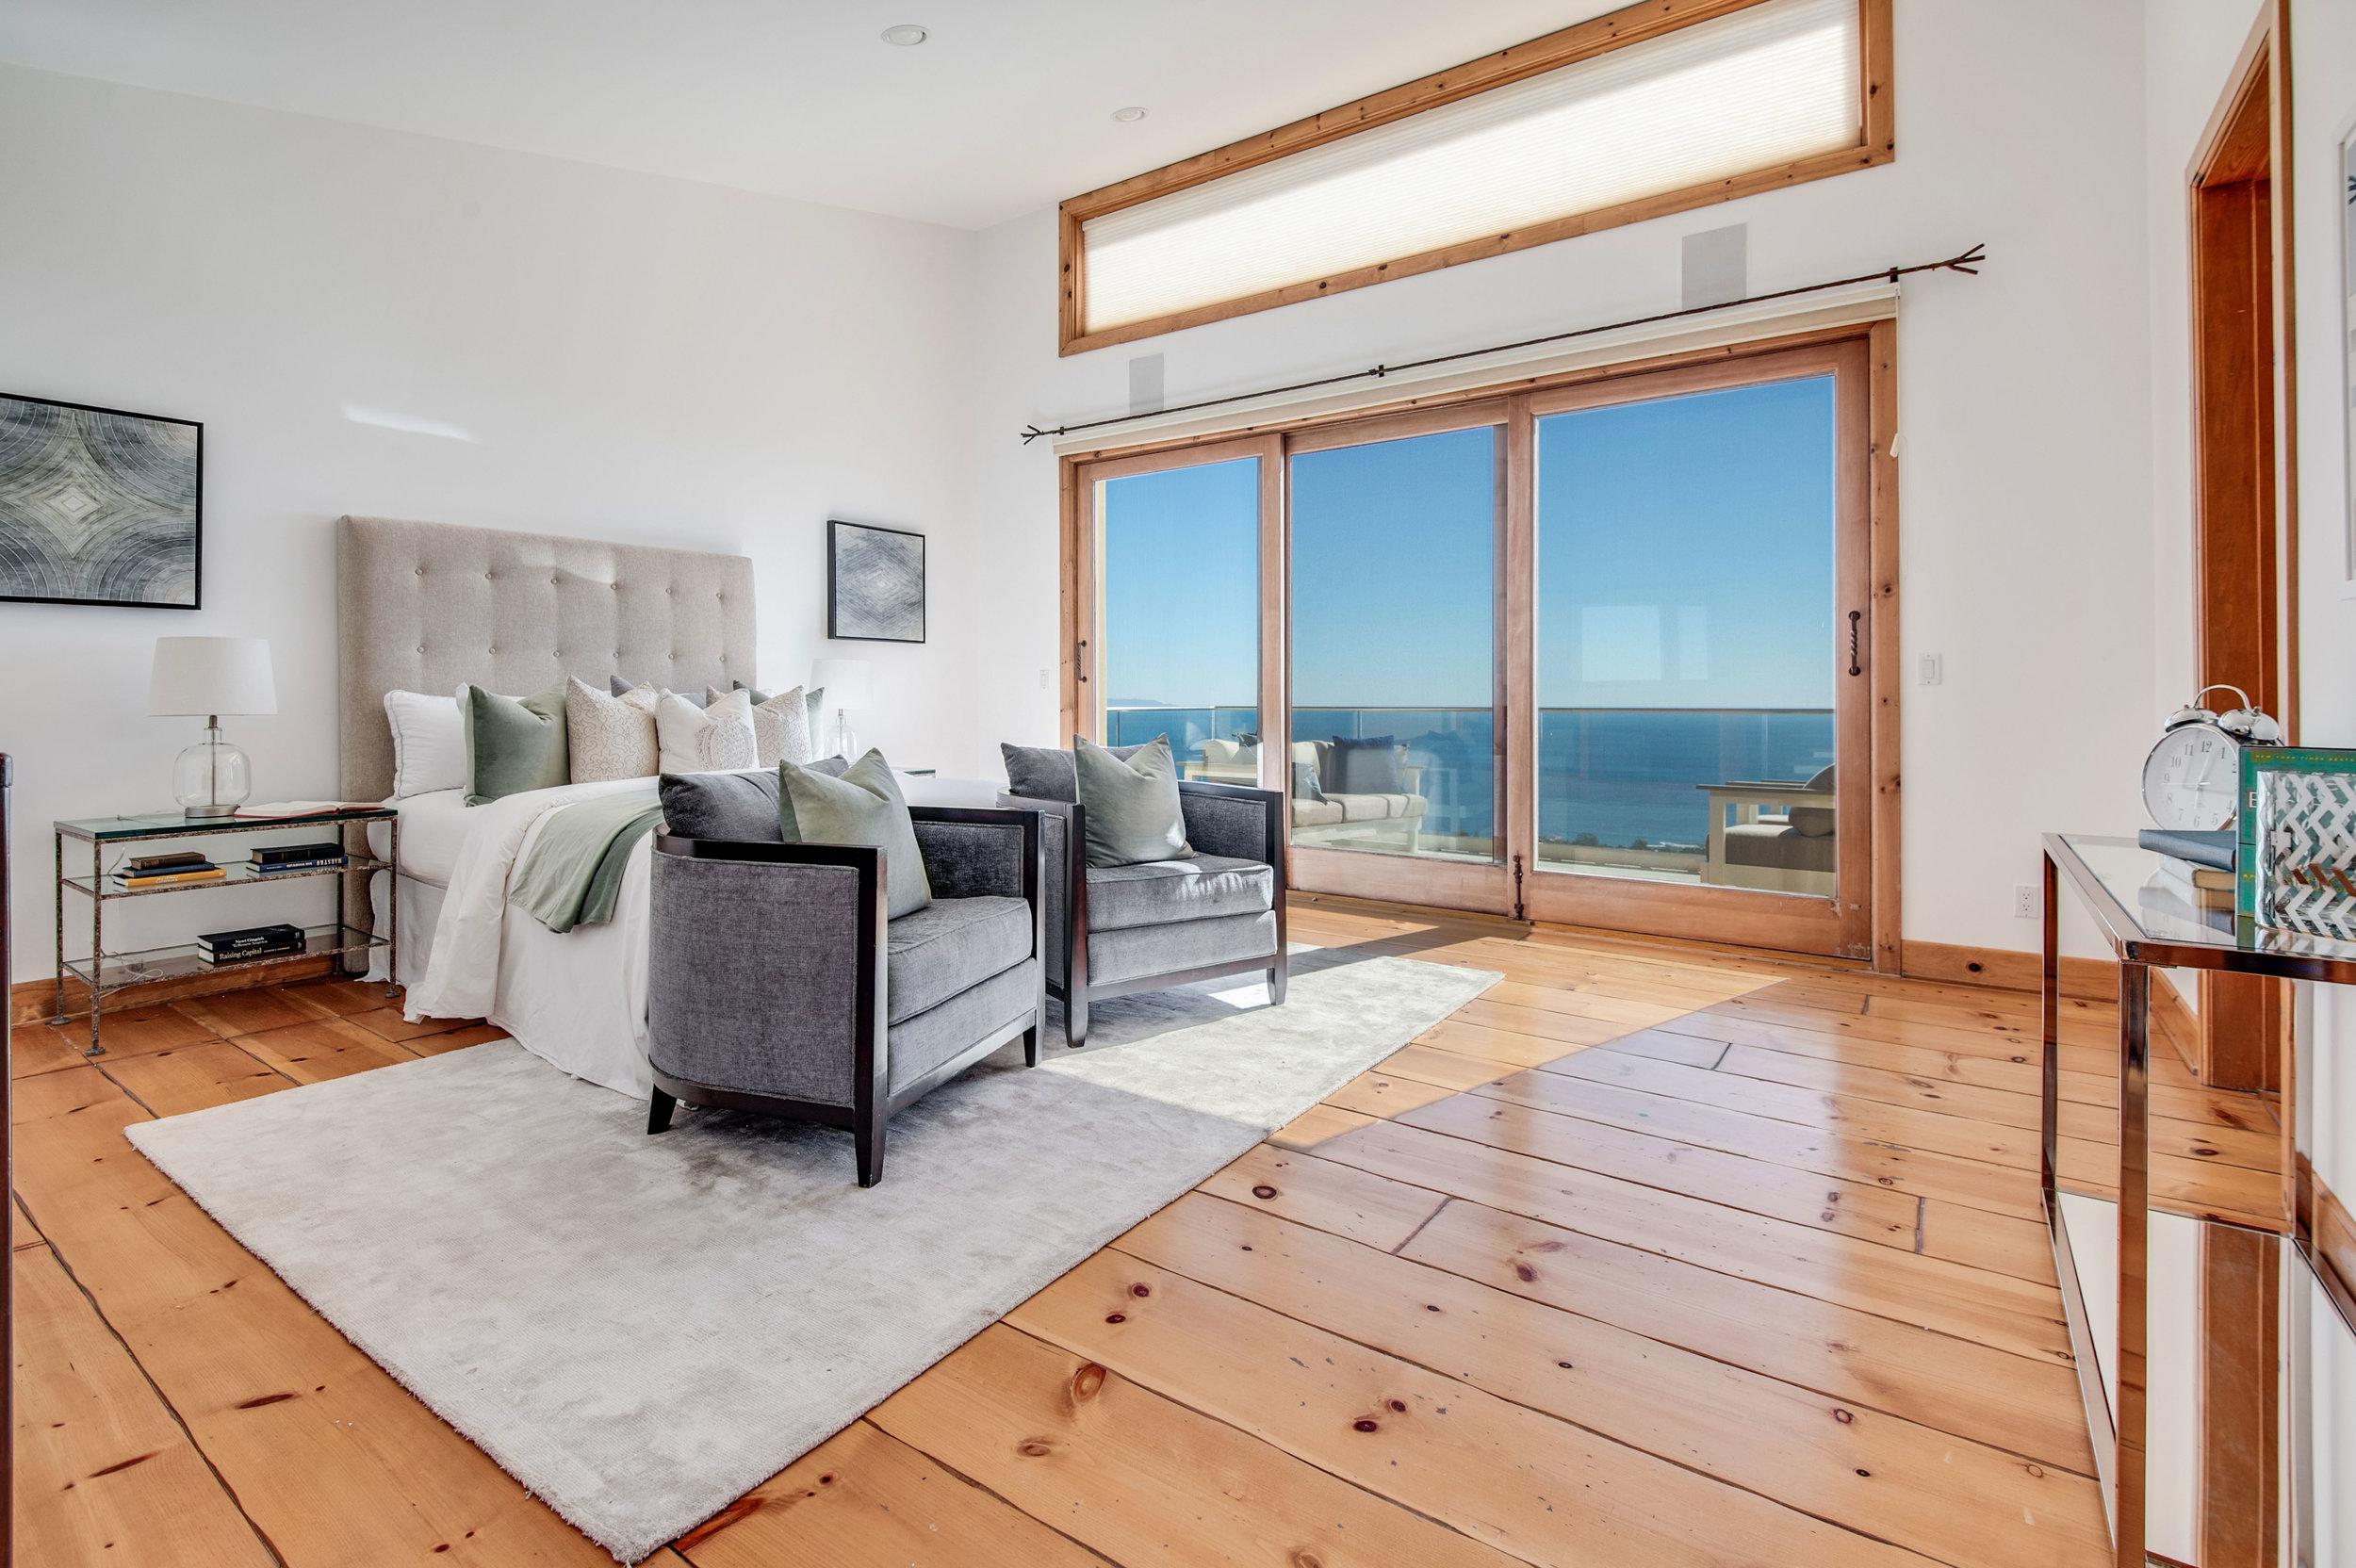 013 Bedroom 27475 Latigo Bay View Drive For Sale Lease The Malibu Life Team Luxury Real Estate.jpg